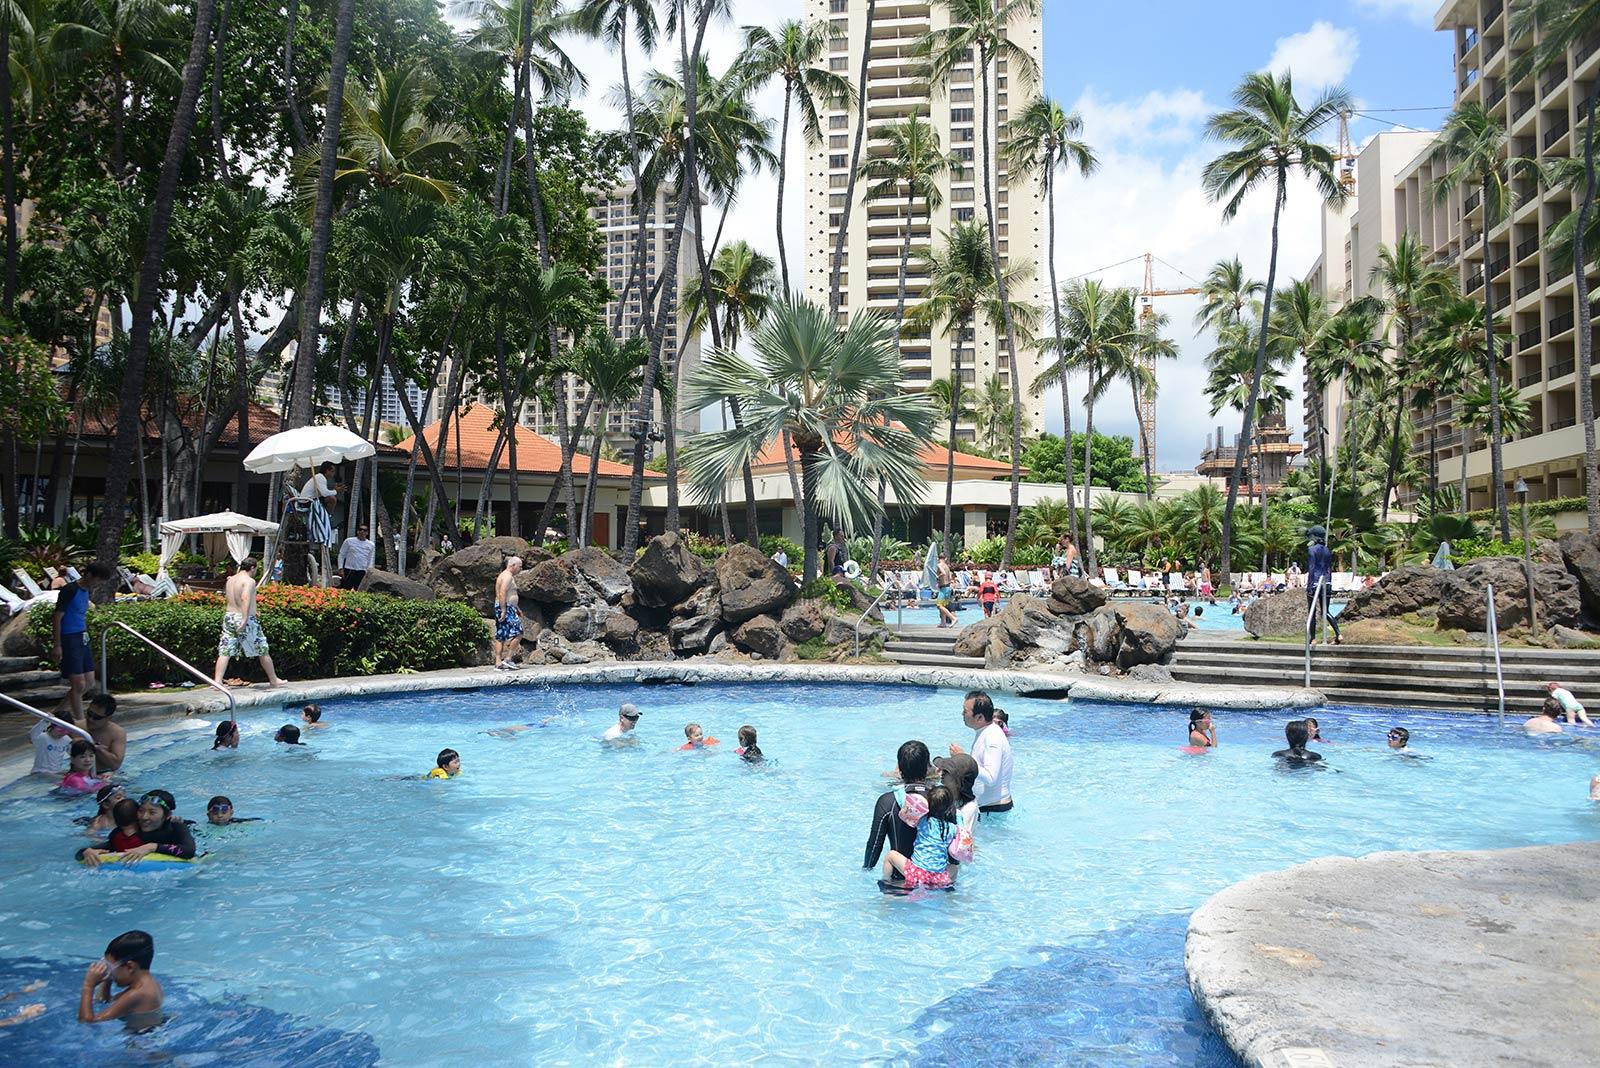 Hilton Grand Vacations Suites at Hilton Hawaiian Village – Kalia Tower timeshare resales